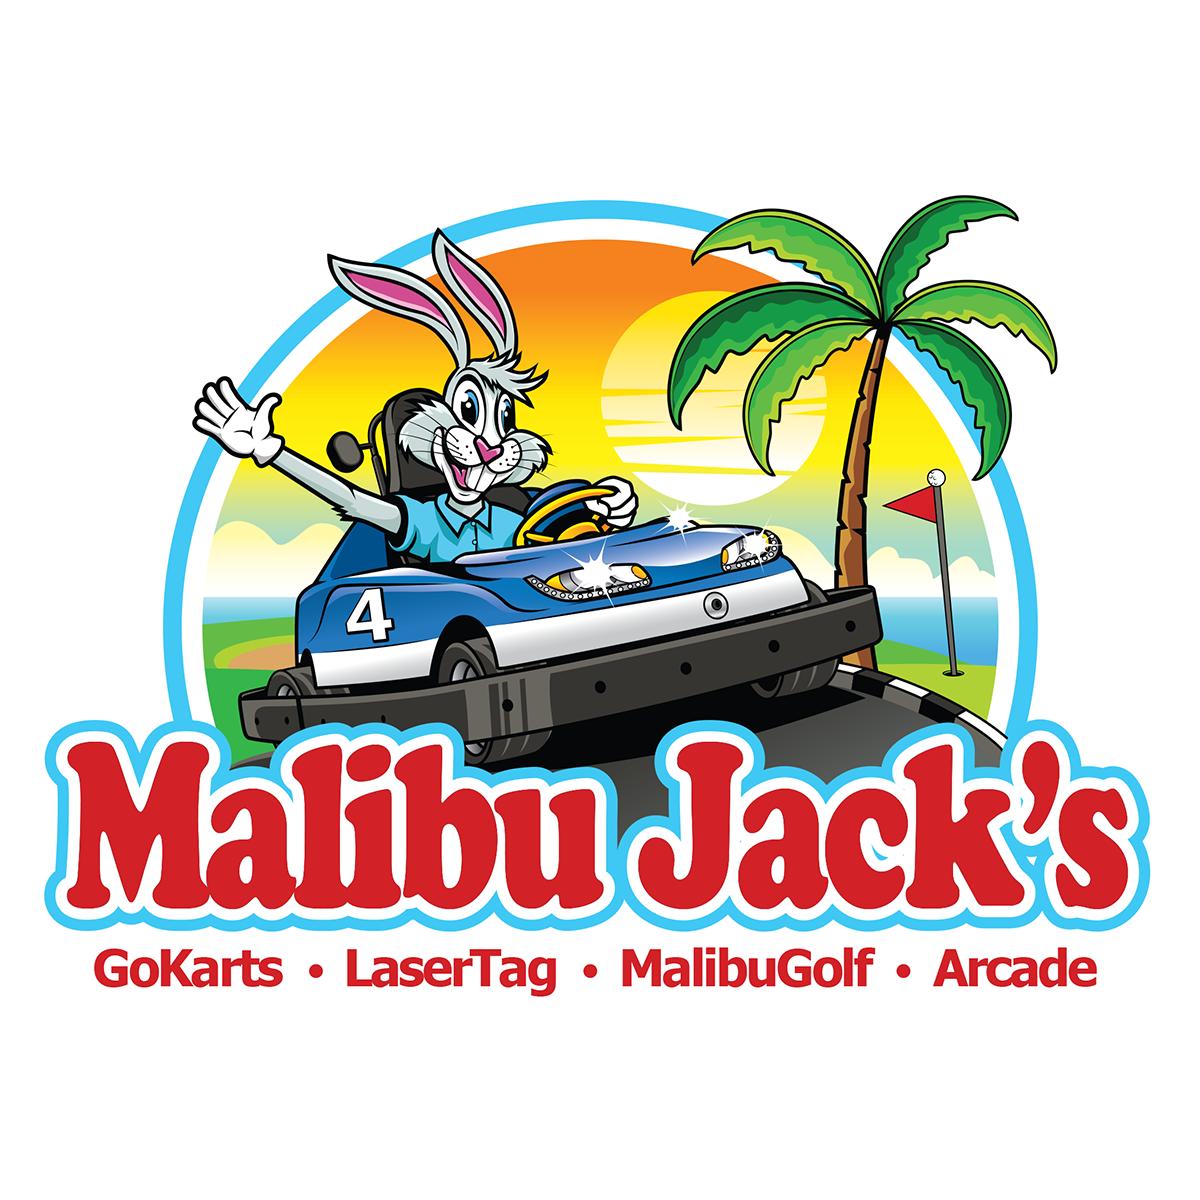 Malibu Jack's Louisville image 5